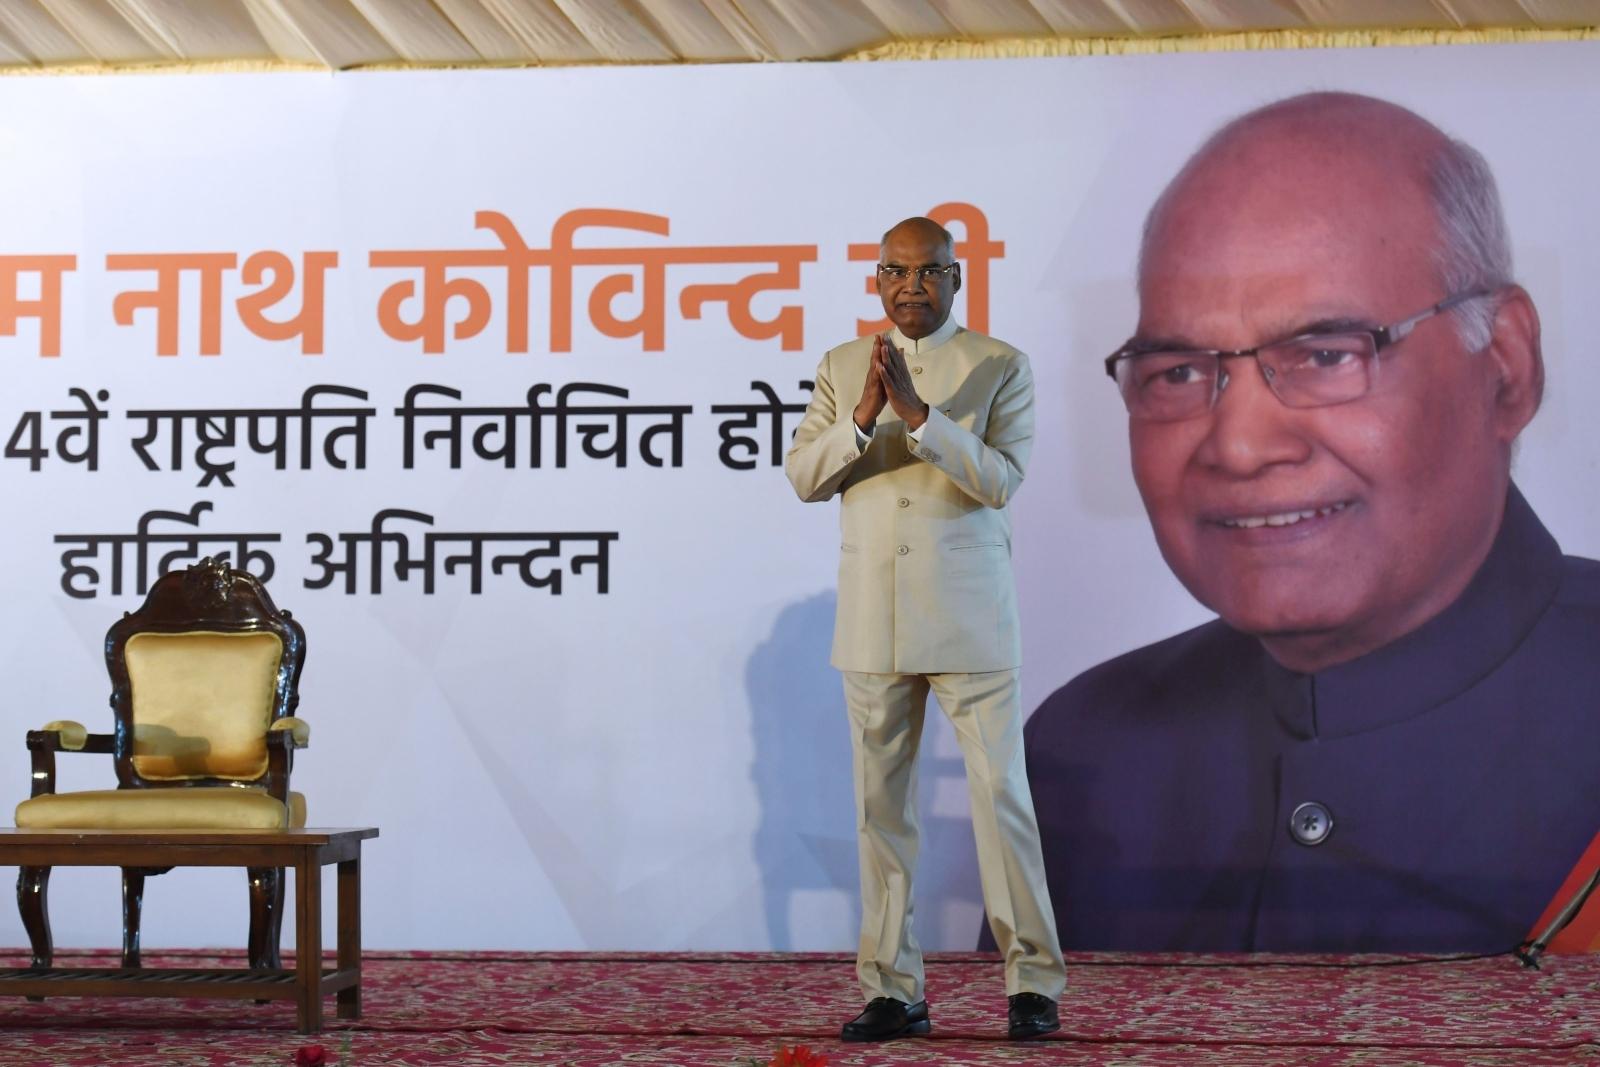 India president elections Ram Nath Kovind